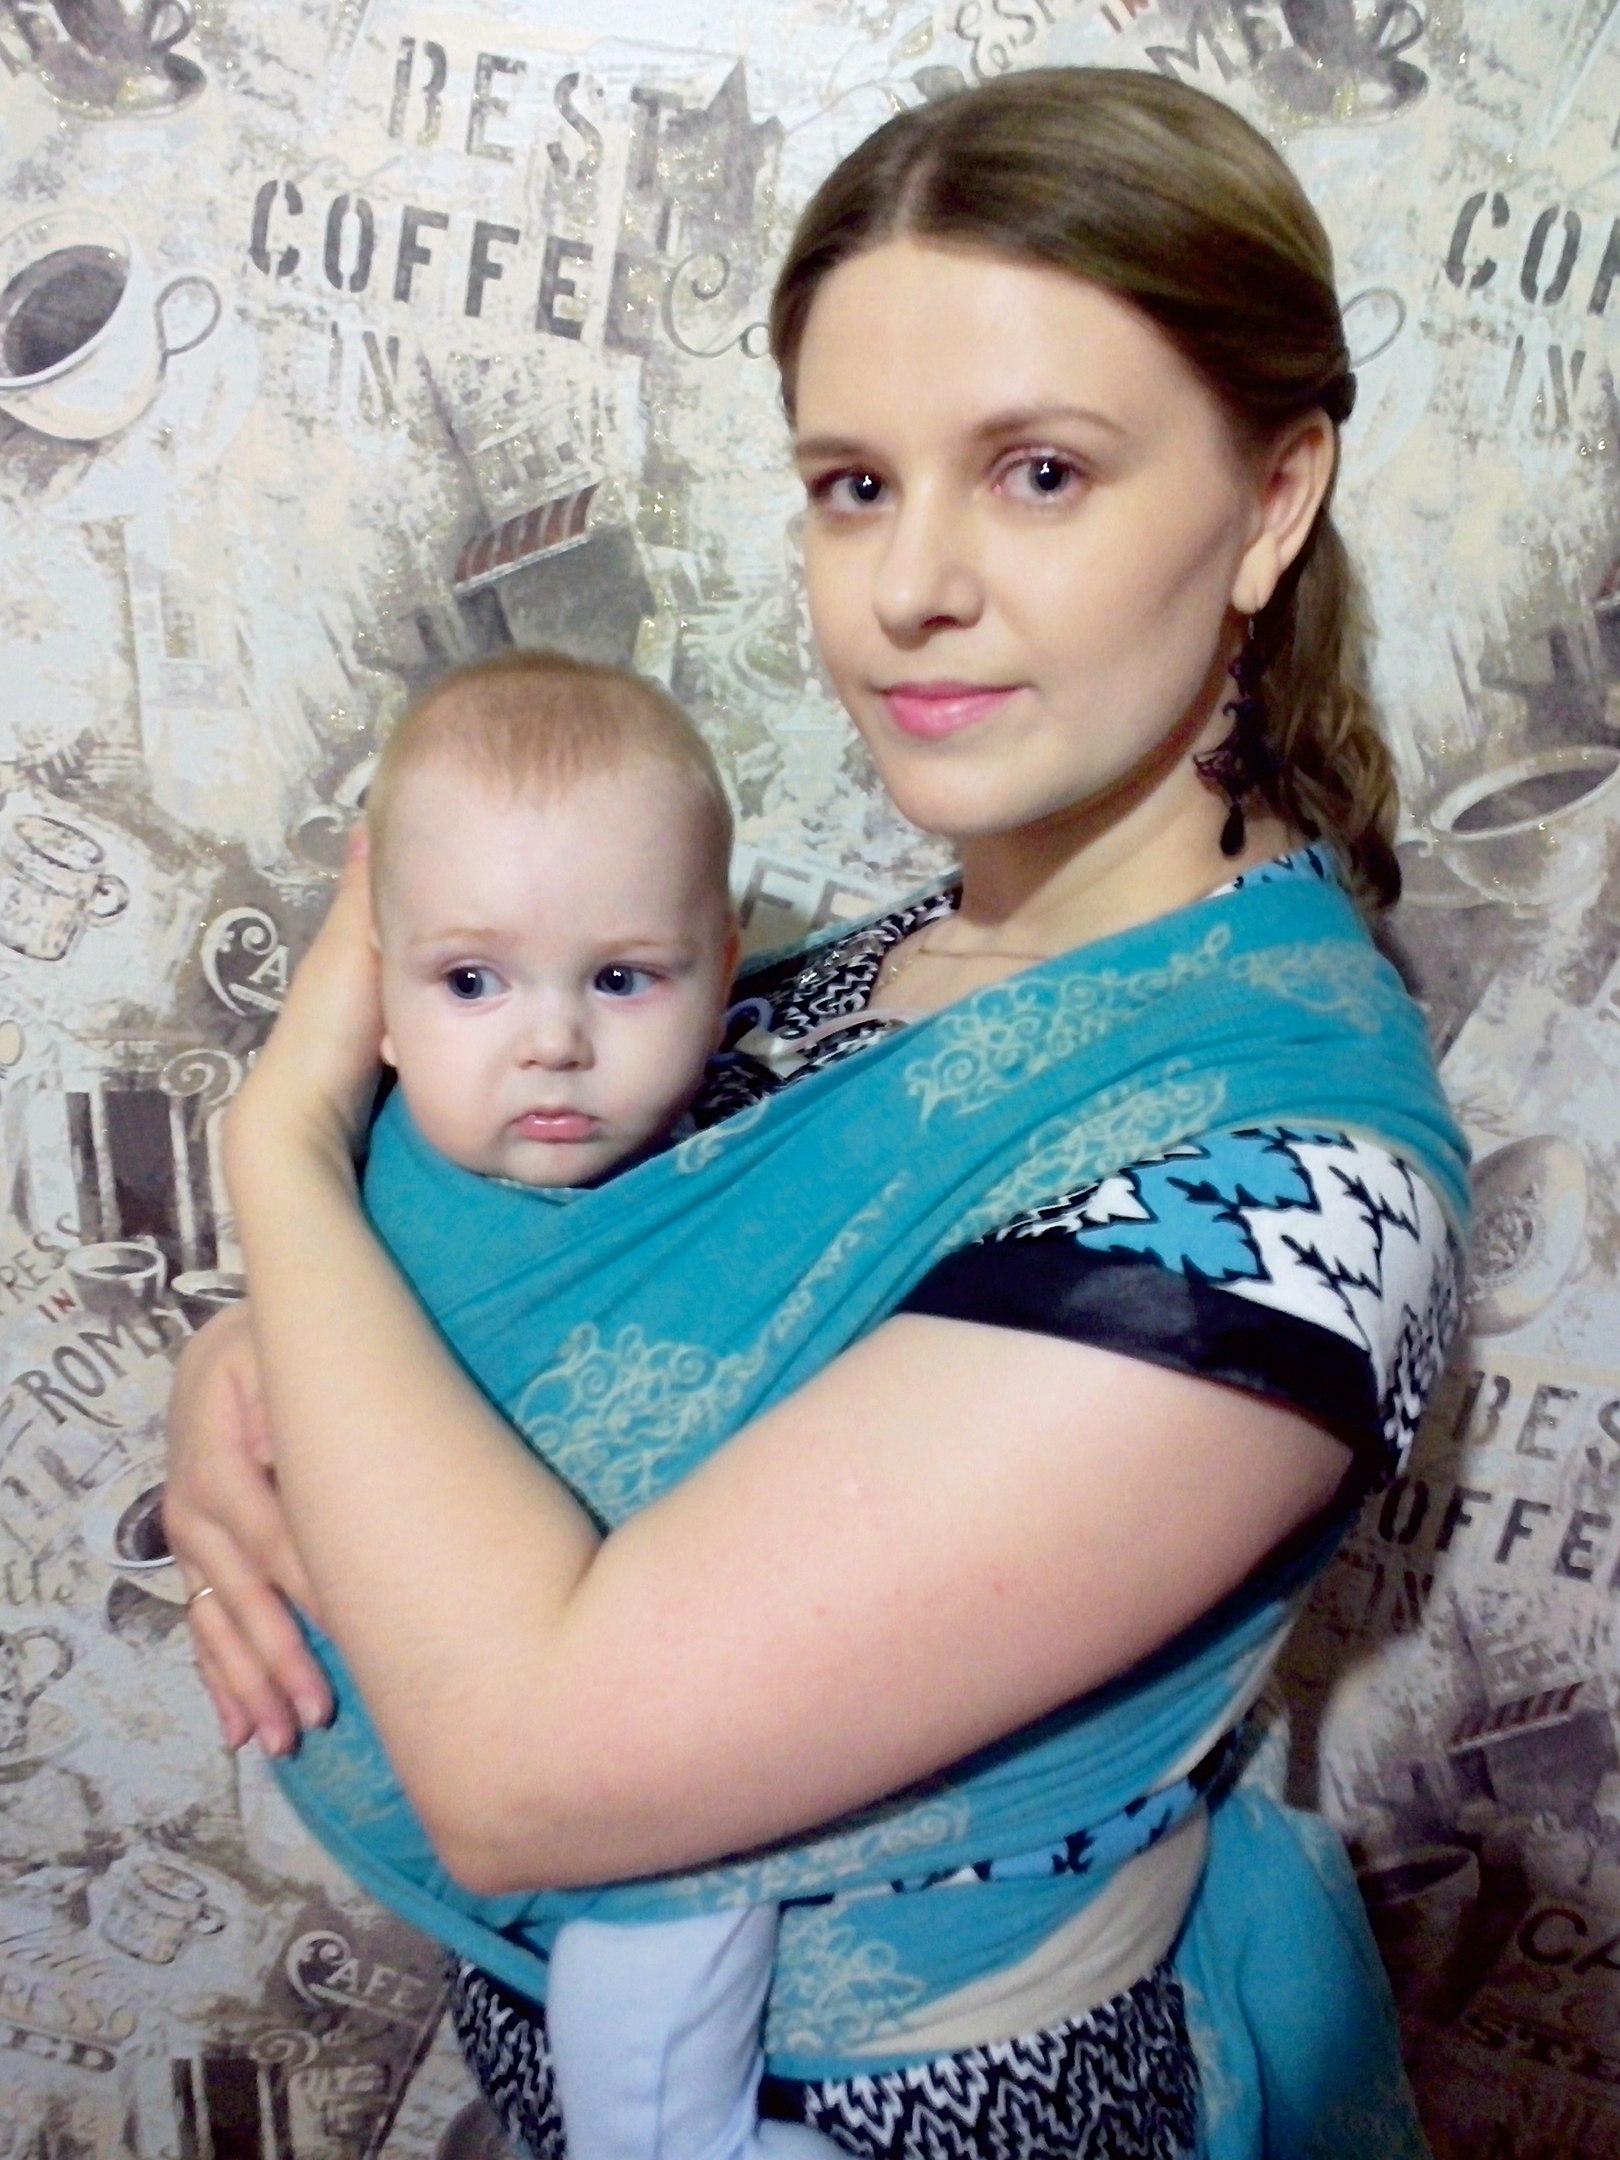 Сын заглянул спящей матери под одеяло фото 263-45